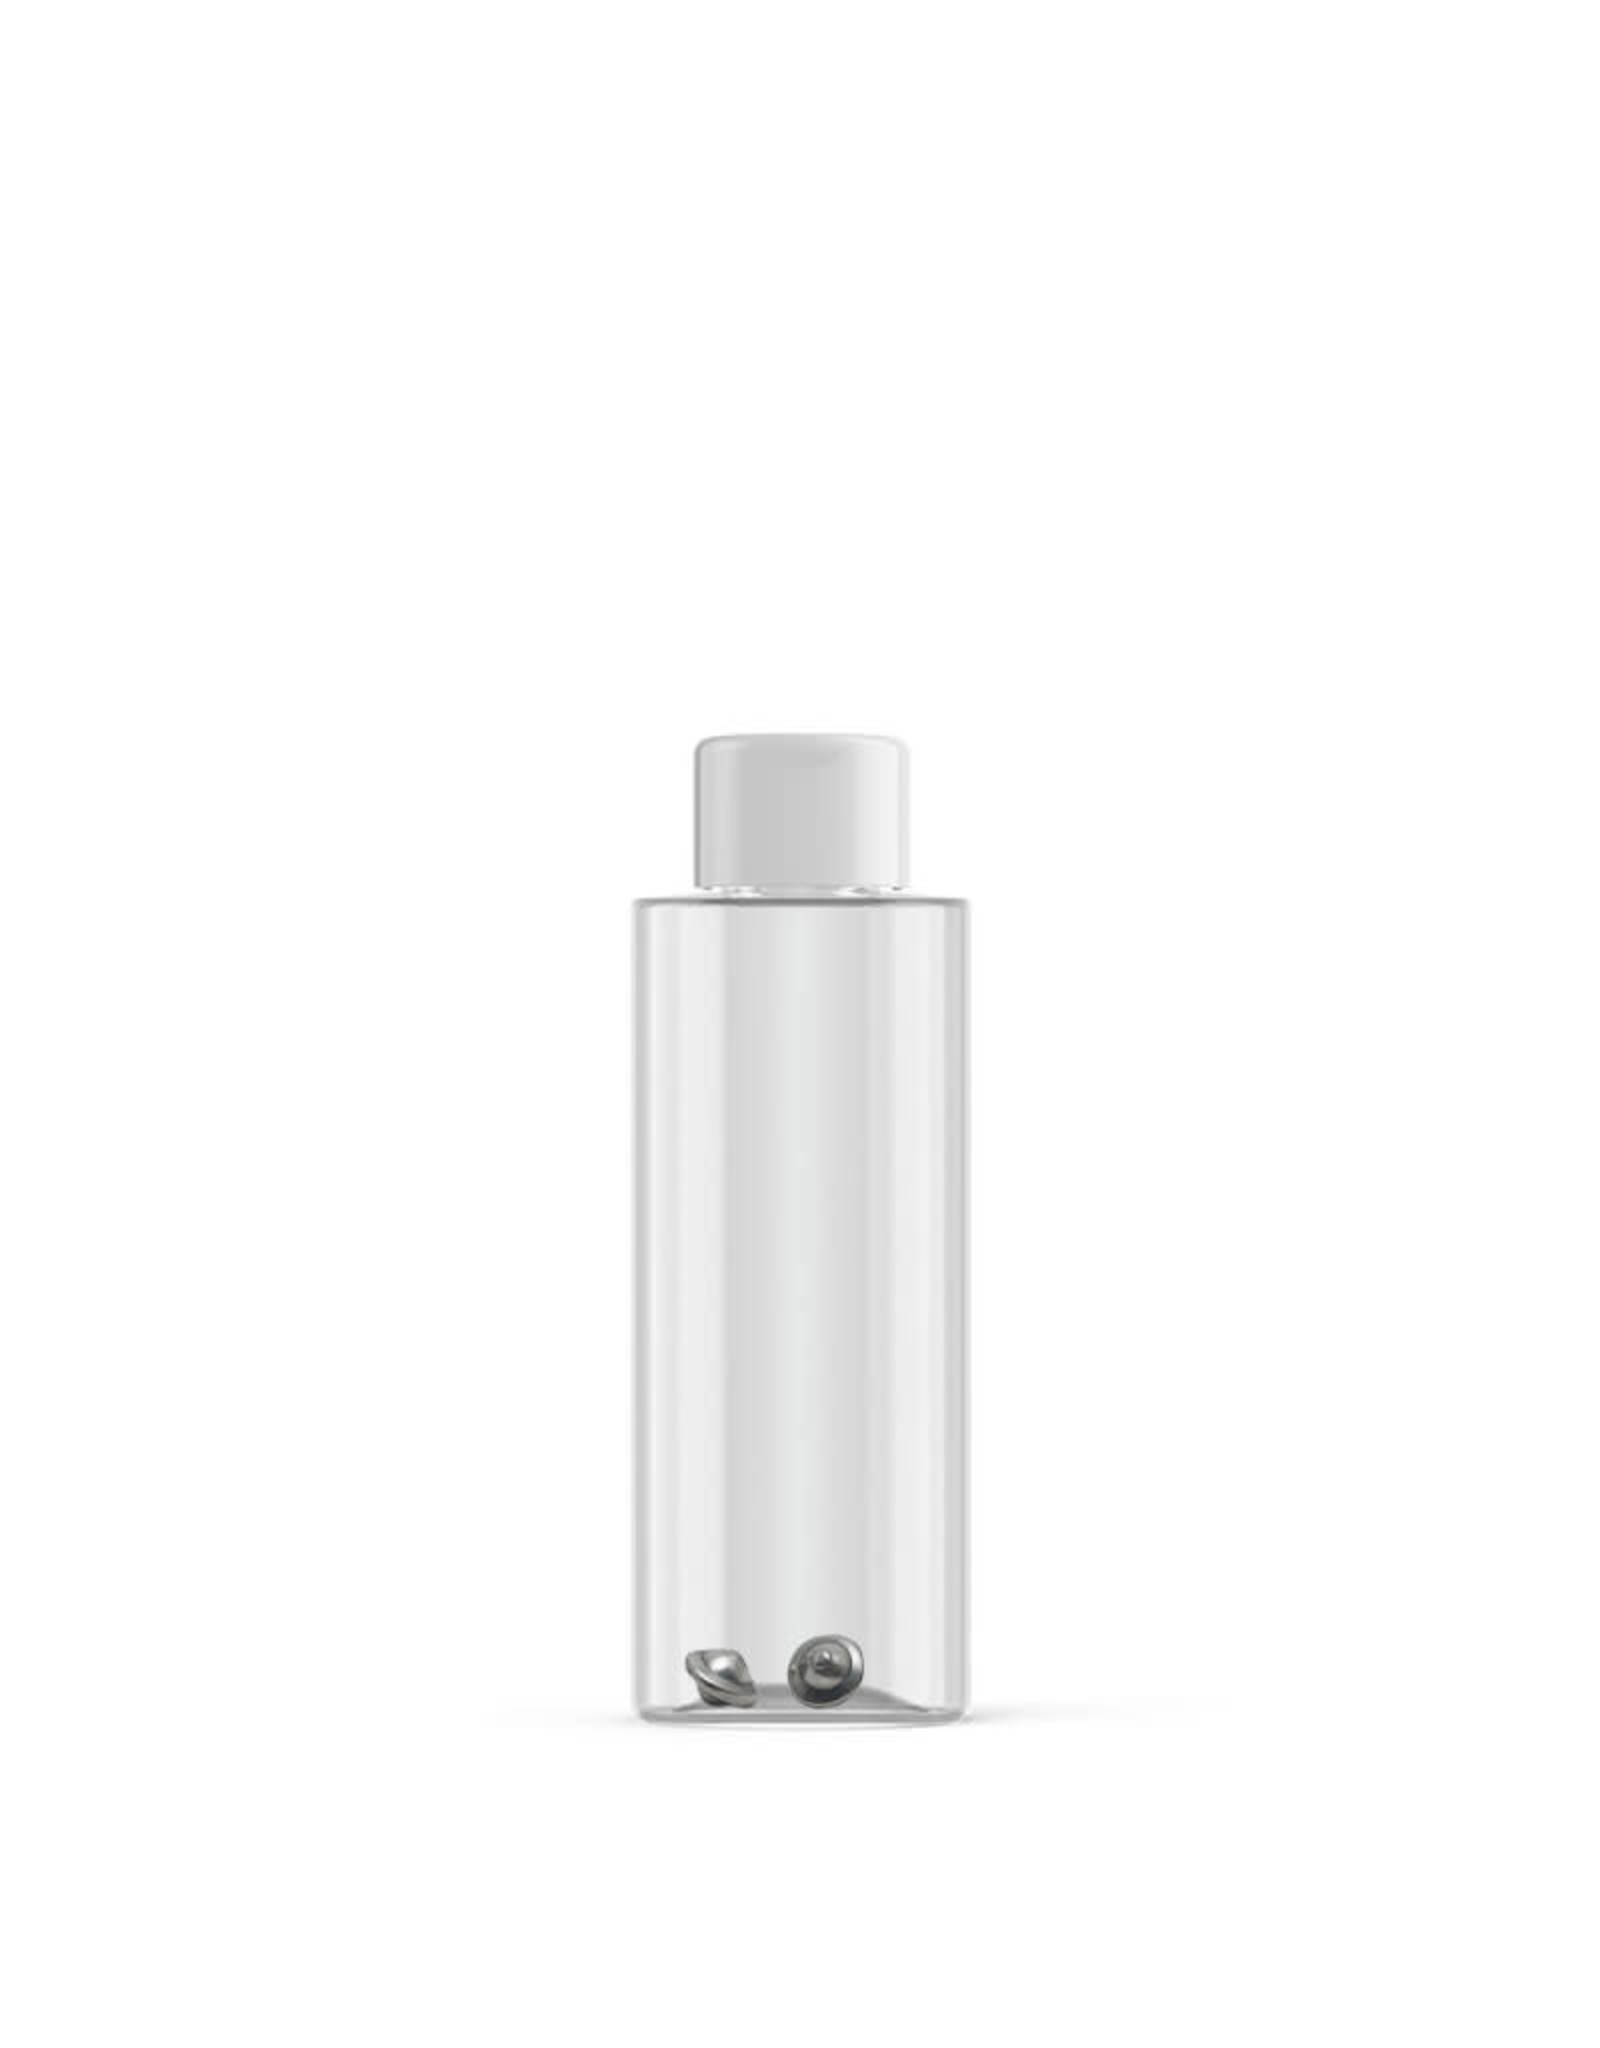 Nipak Nipak Empty Bottle with White Cap and Insert + Paint Rattlers